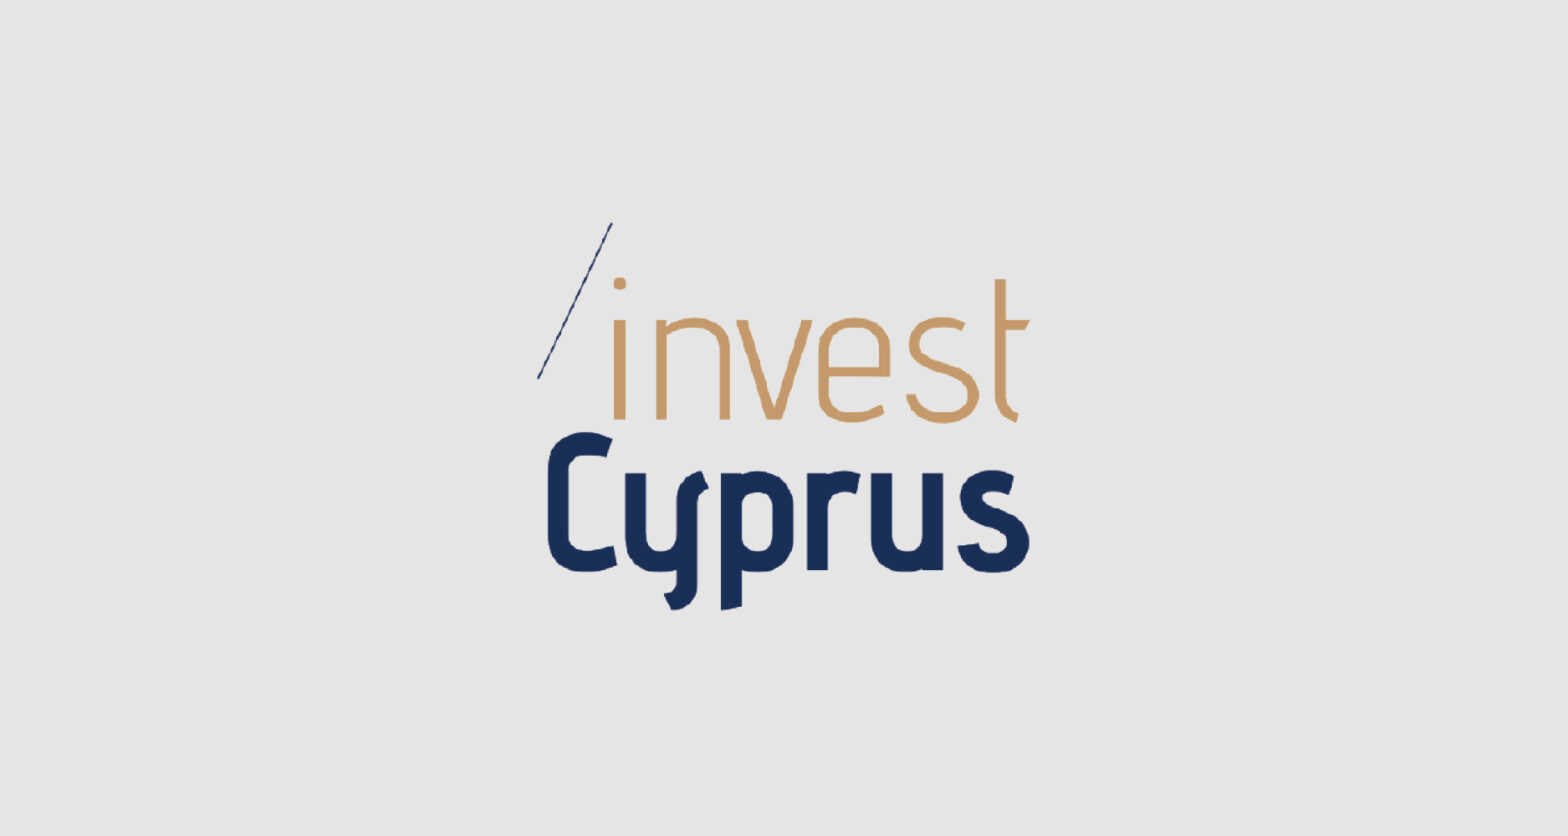 Invest Cyprus announces new award celebrating entrepreneurship in technology and innovation